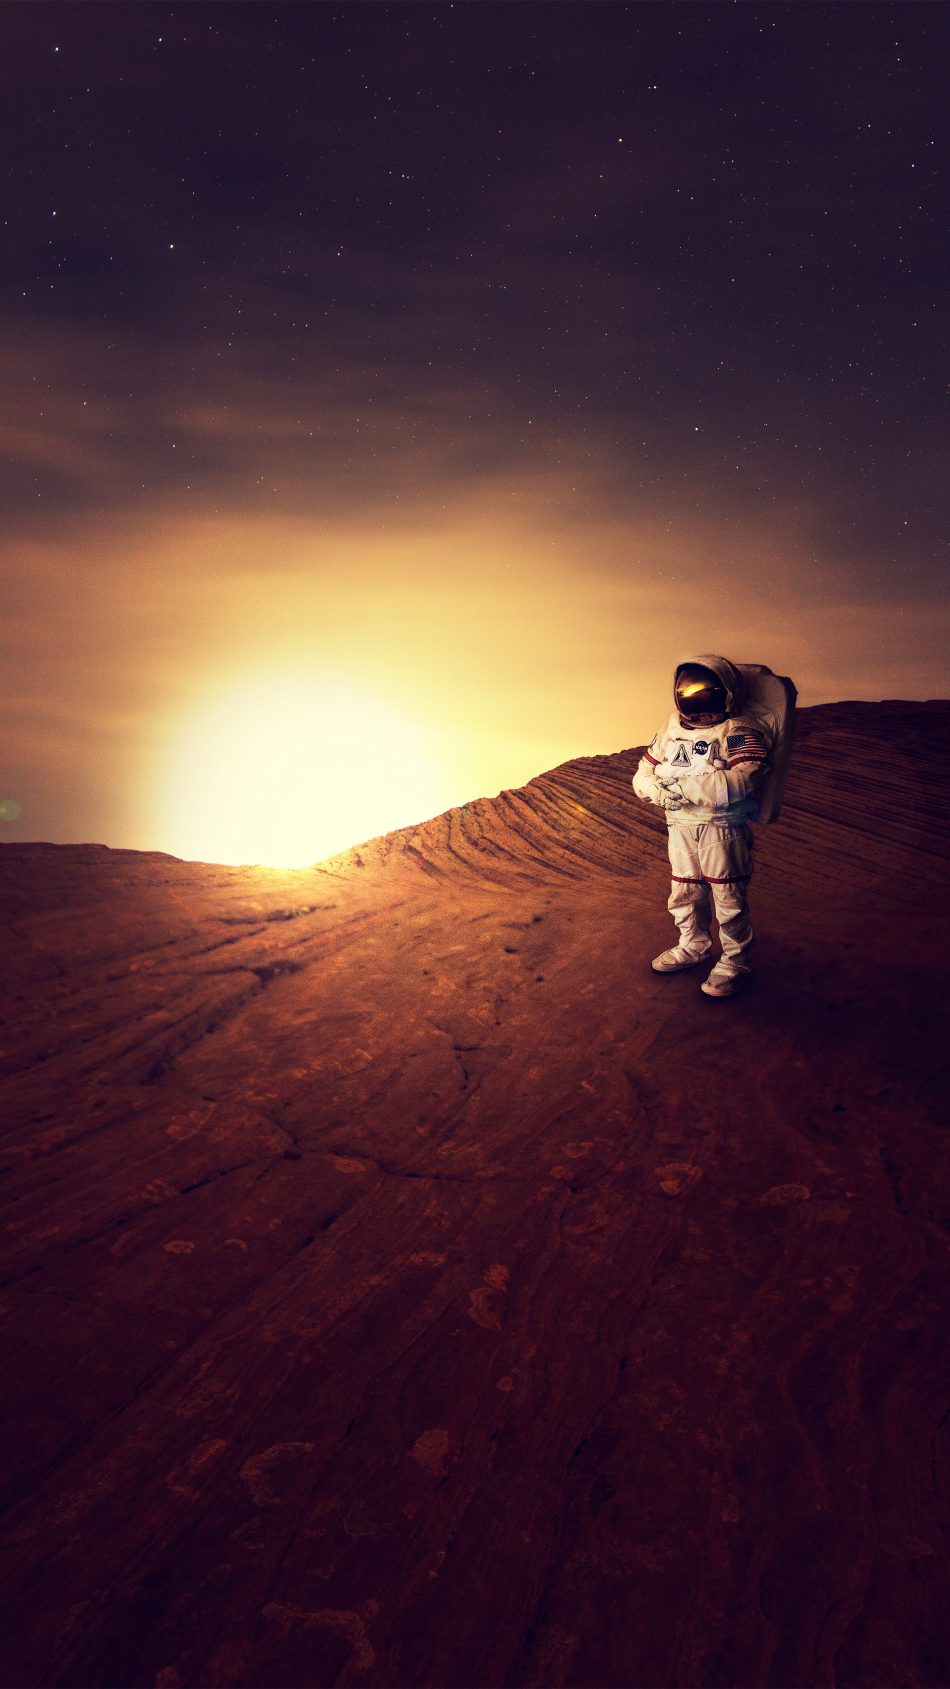 Download astronaut on planet mars sunset free pure 4k - Mars sunset wallpaper ...